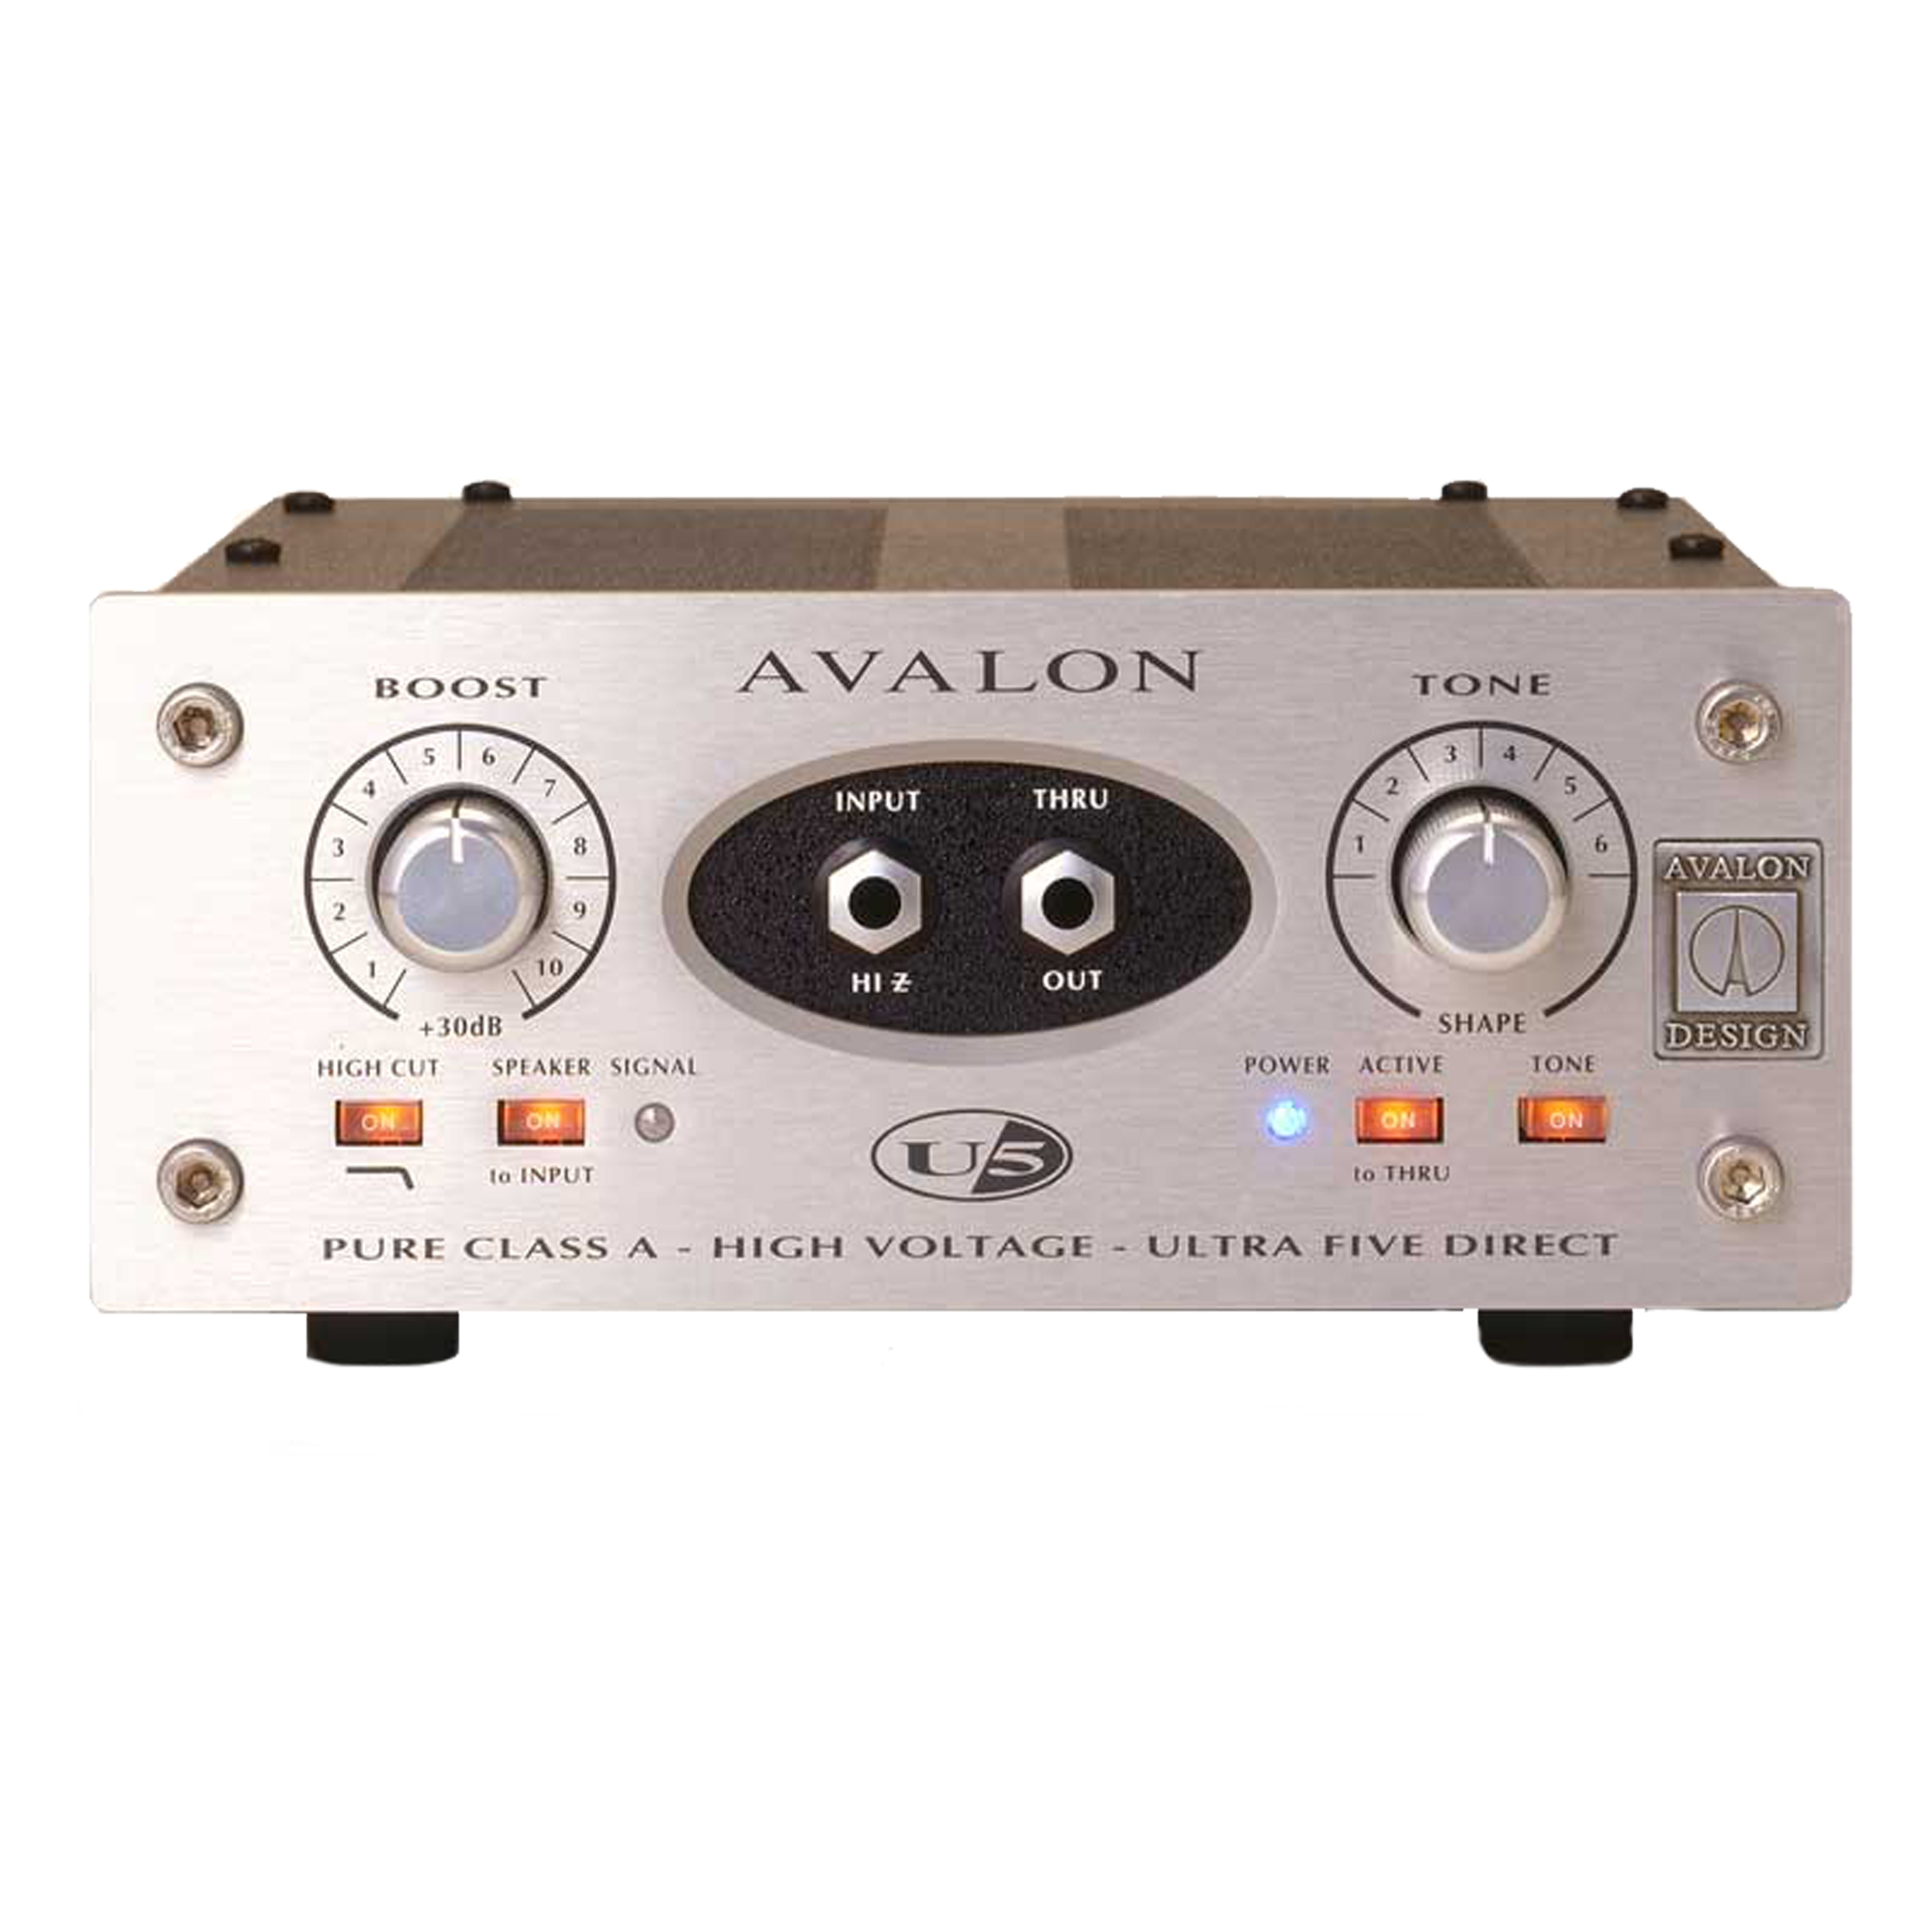 Avalon U5 Single-Channel High Voltage Instrument DI Preamp by Avalon